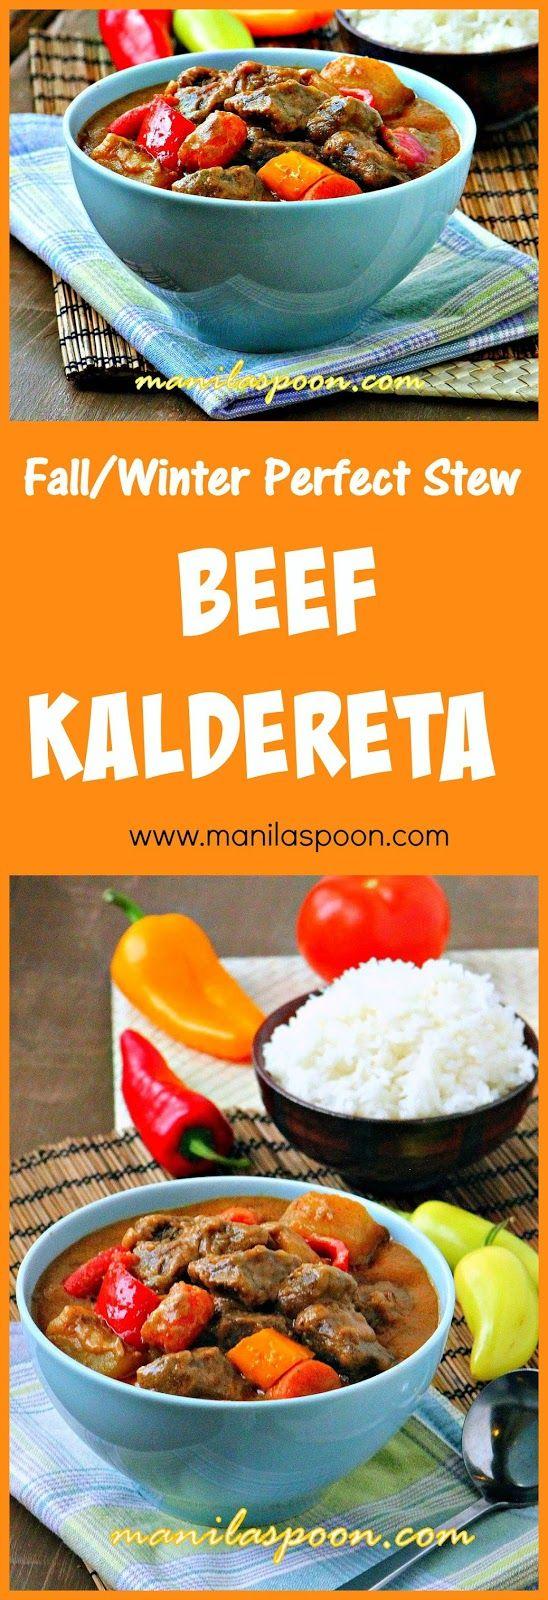 Creamy, nutty, spicy and delicious beef chunks stewed in coconut milk.This tasty beef stew is comfort food at its best - BEEF KALDERETA #caldereta #kaldereta